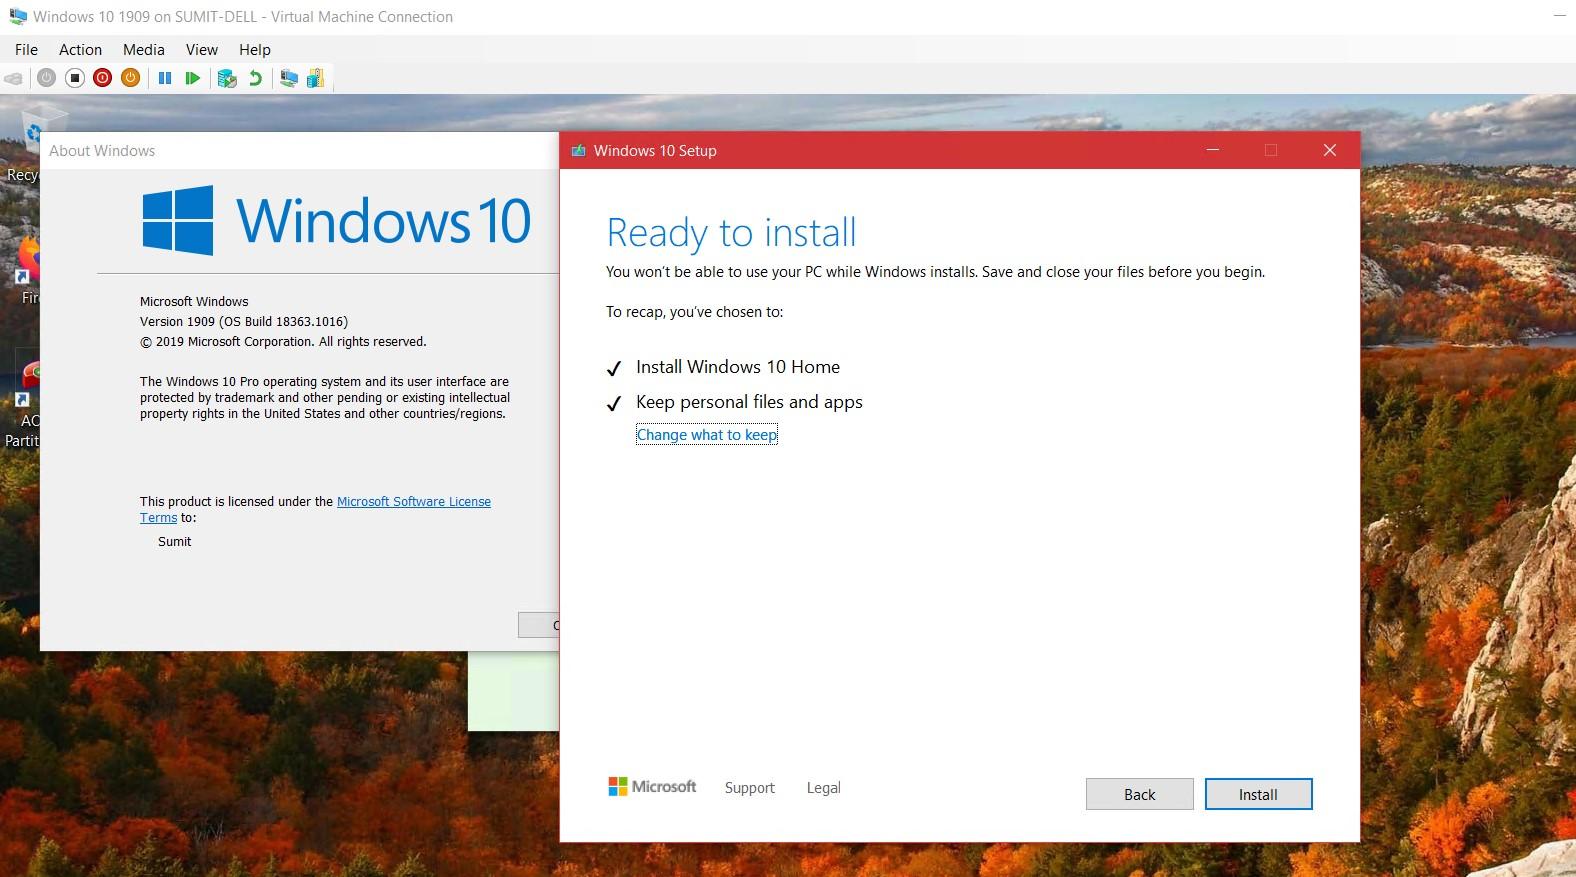 How to downgrade Windows 10 Pro to Windows 10 Home without loosing data cc32ee6c-f4b8-46a5-b082-31717b3dea0f?upload=true.jpg